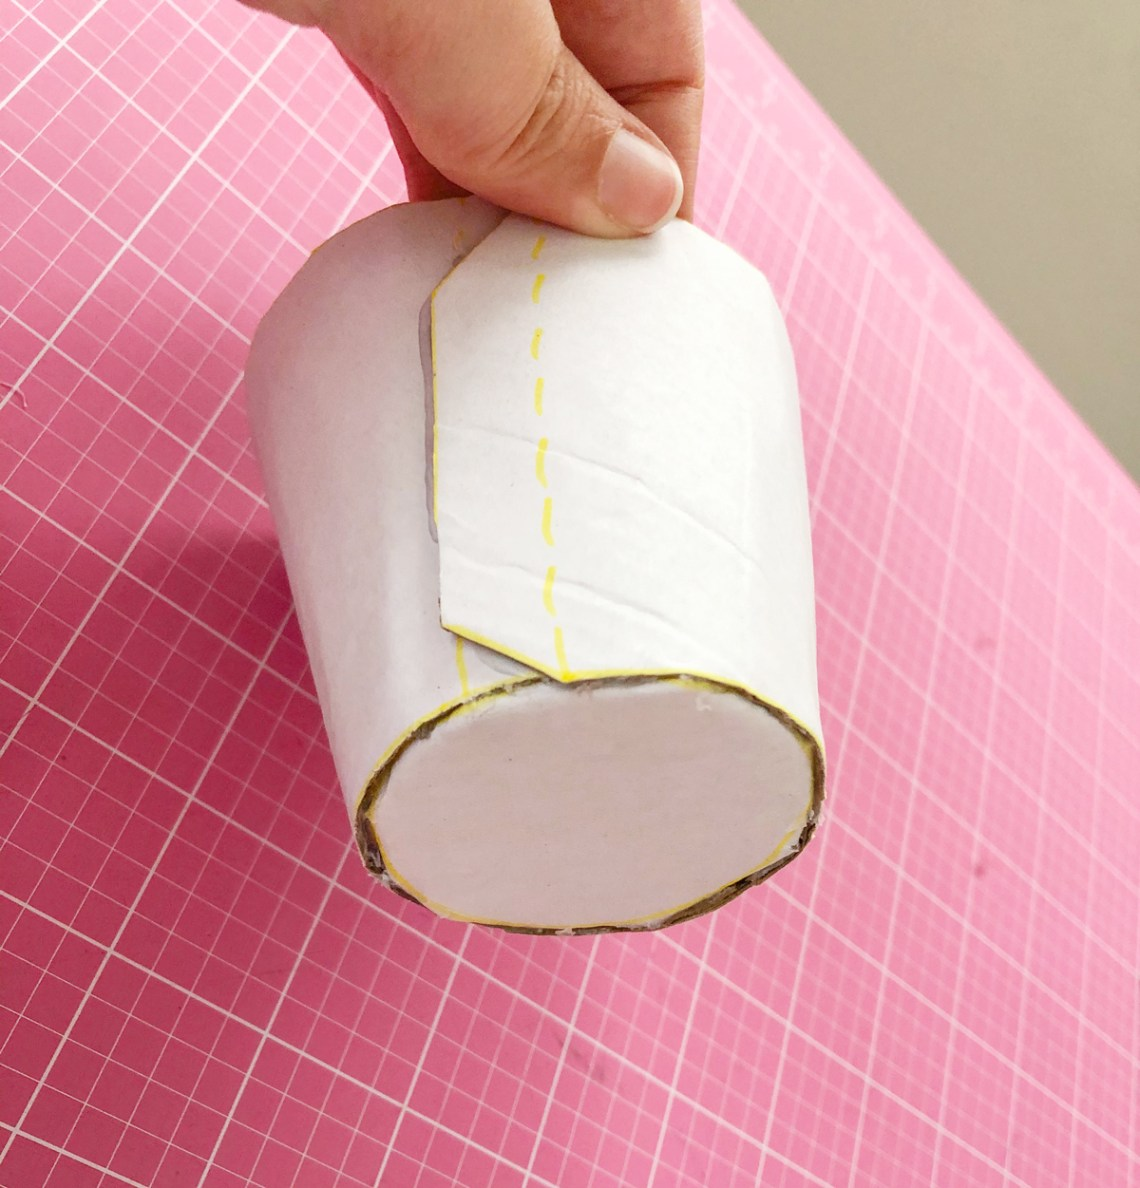 Felt Ice Cream Pin Cushion Tutorial hot glue to close cup